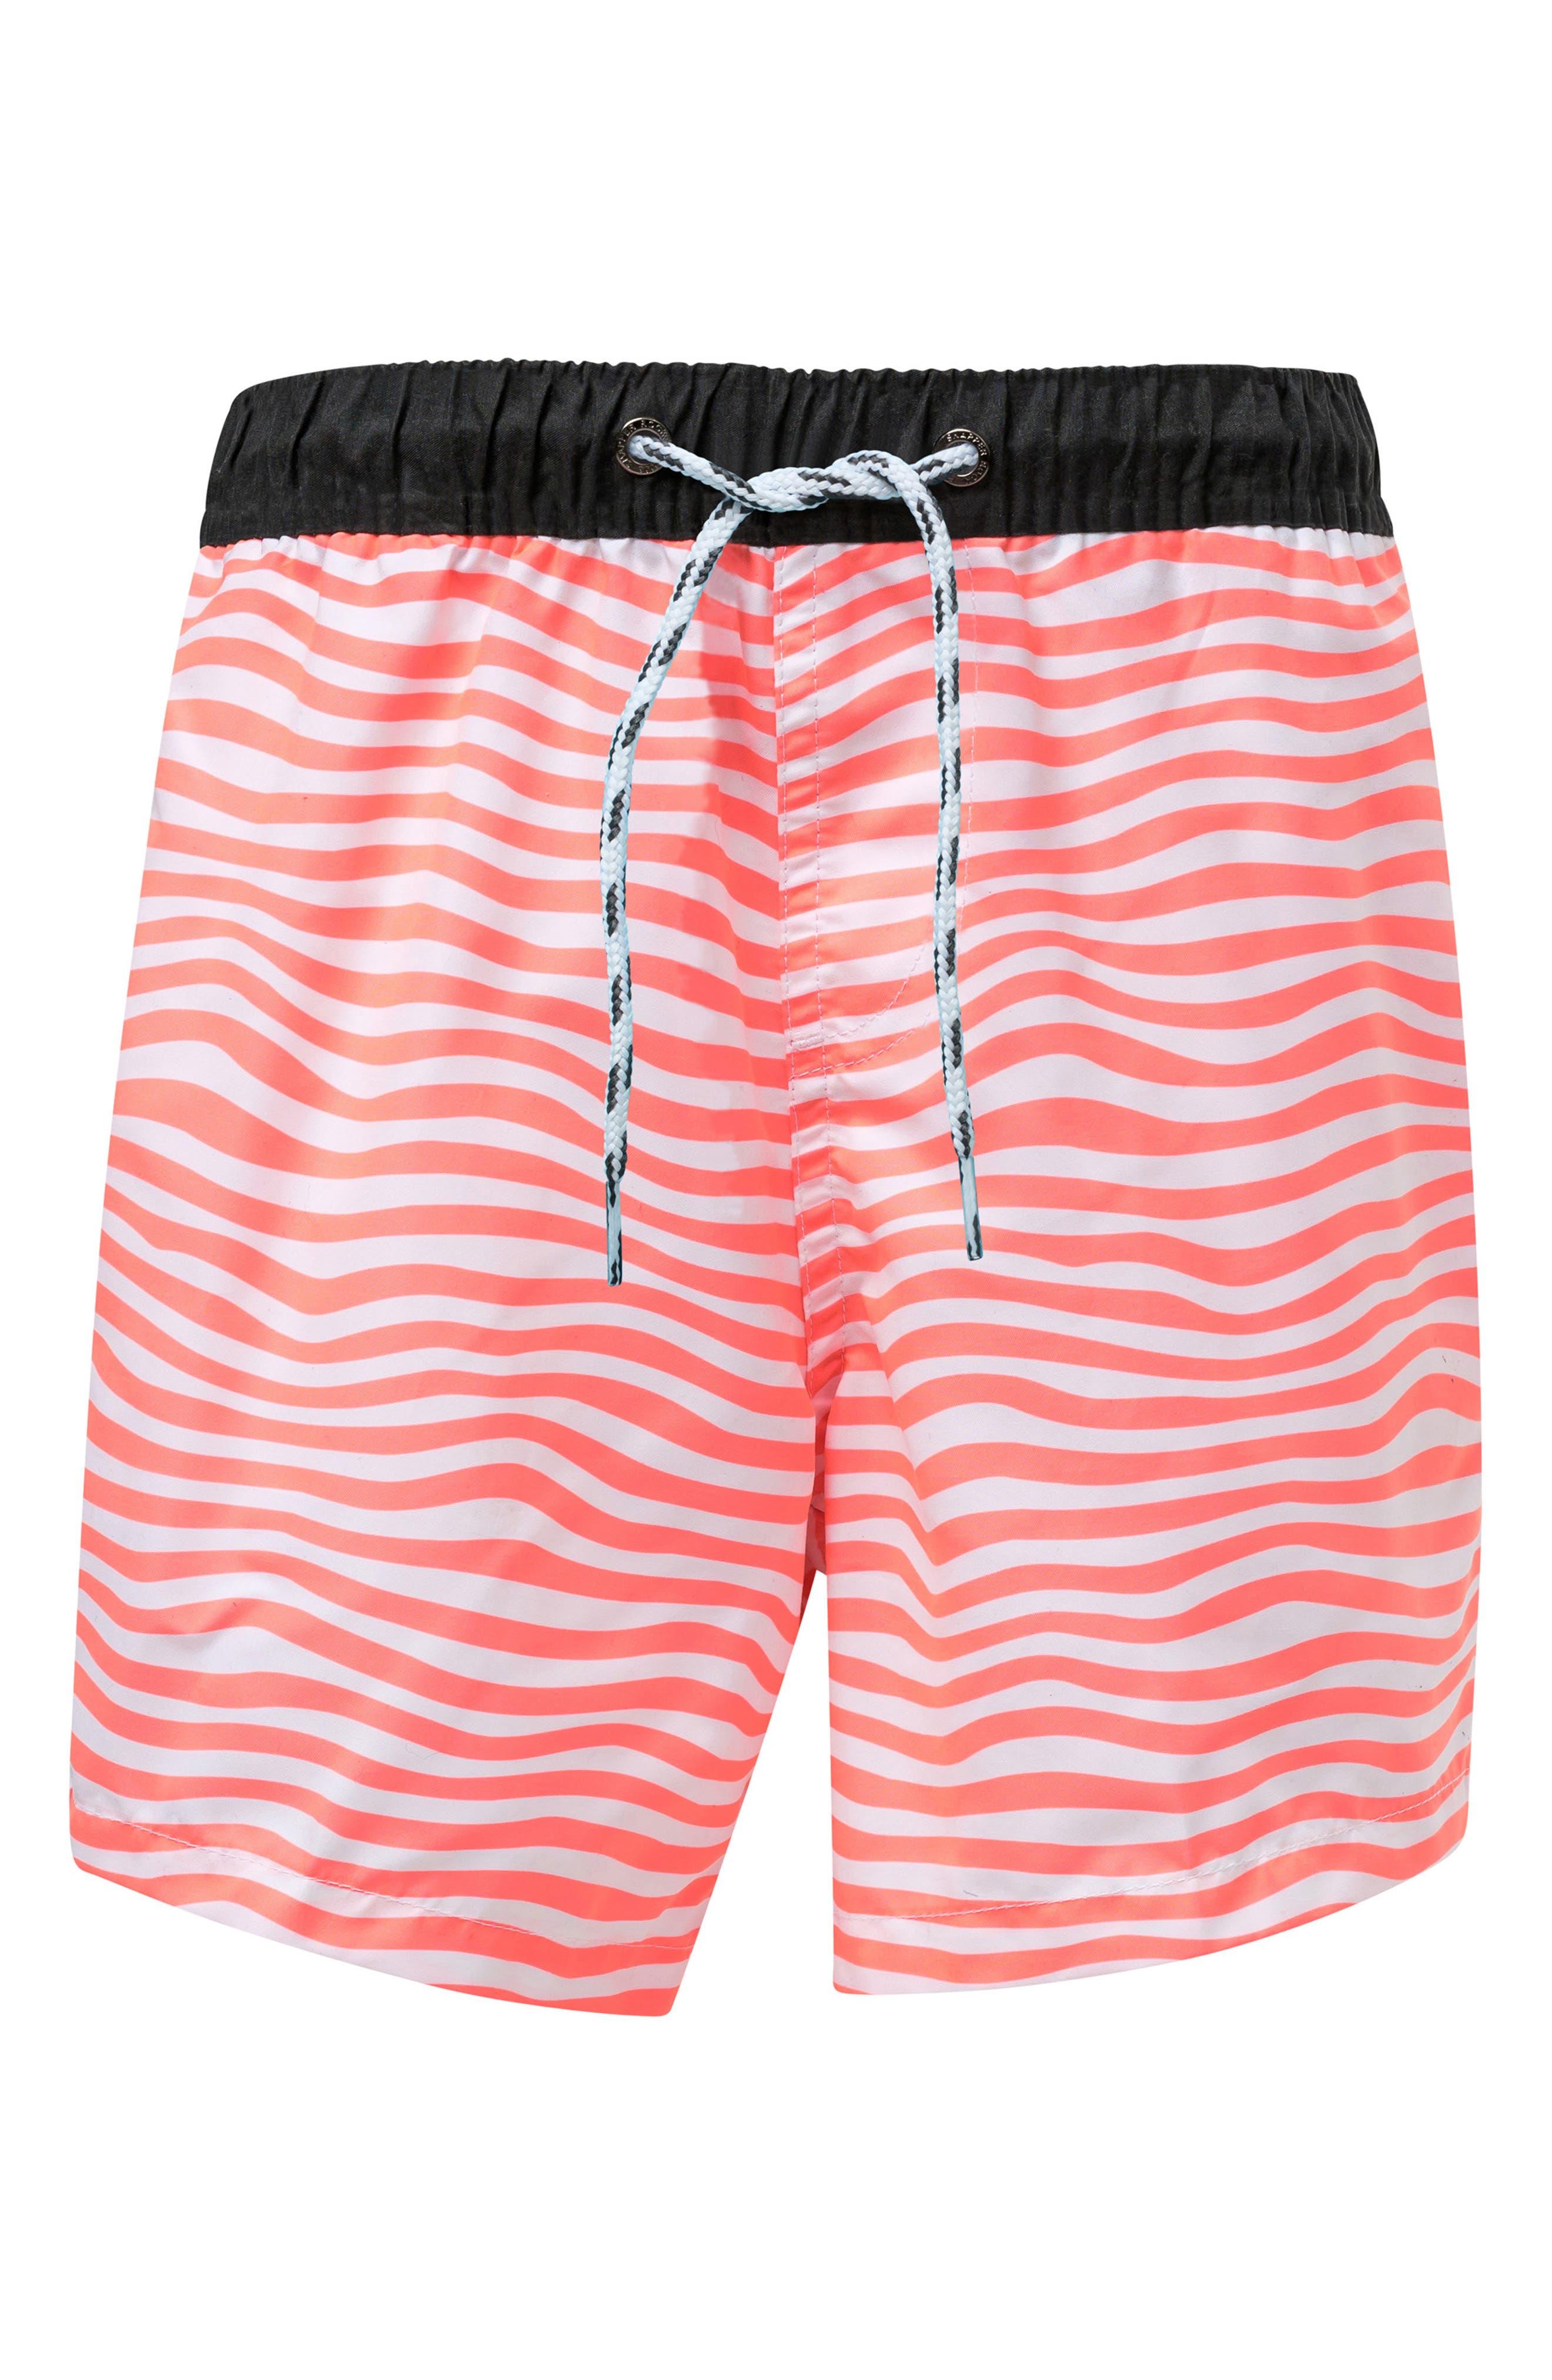 SNAPPER ROCK Orange Crush Swim Trunks, Main, color, BRIGHT ORANGE